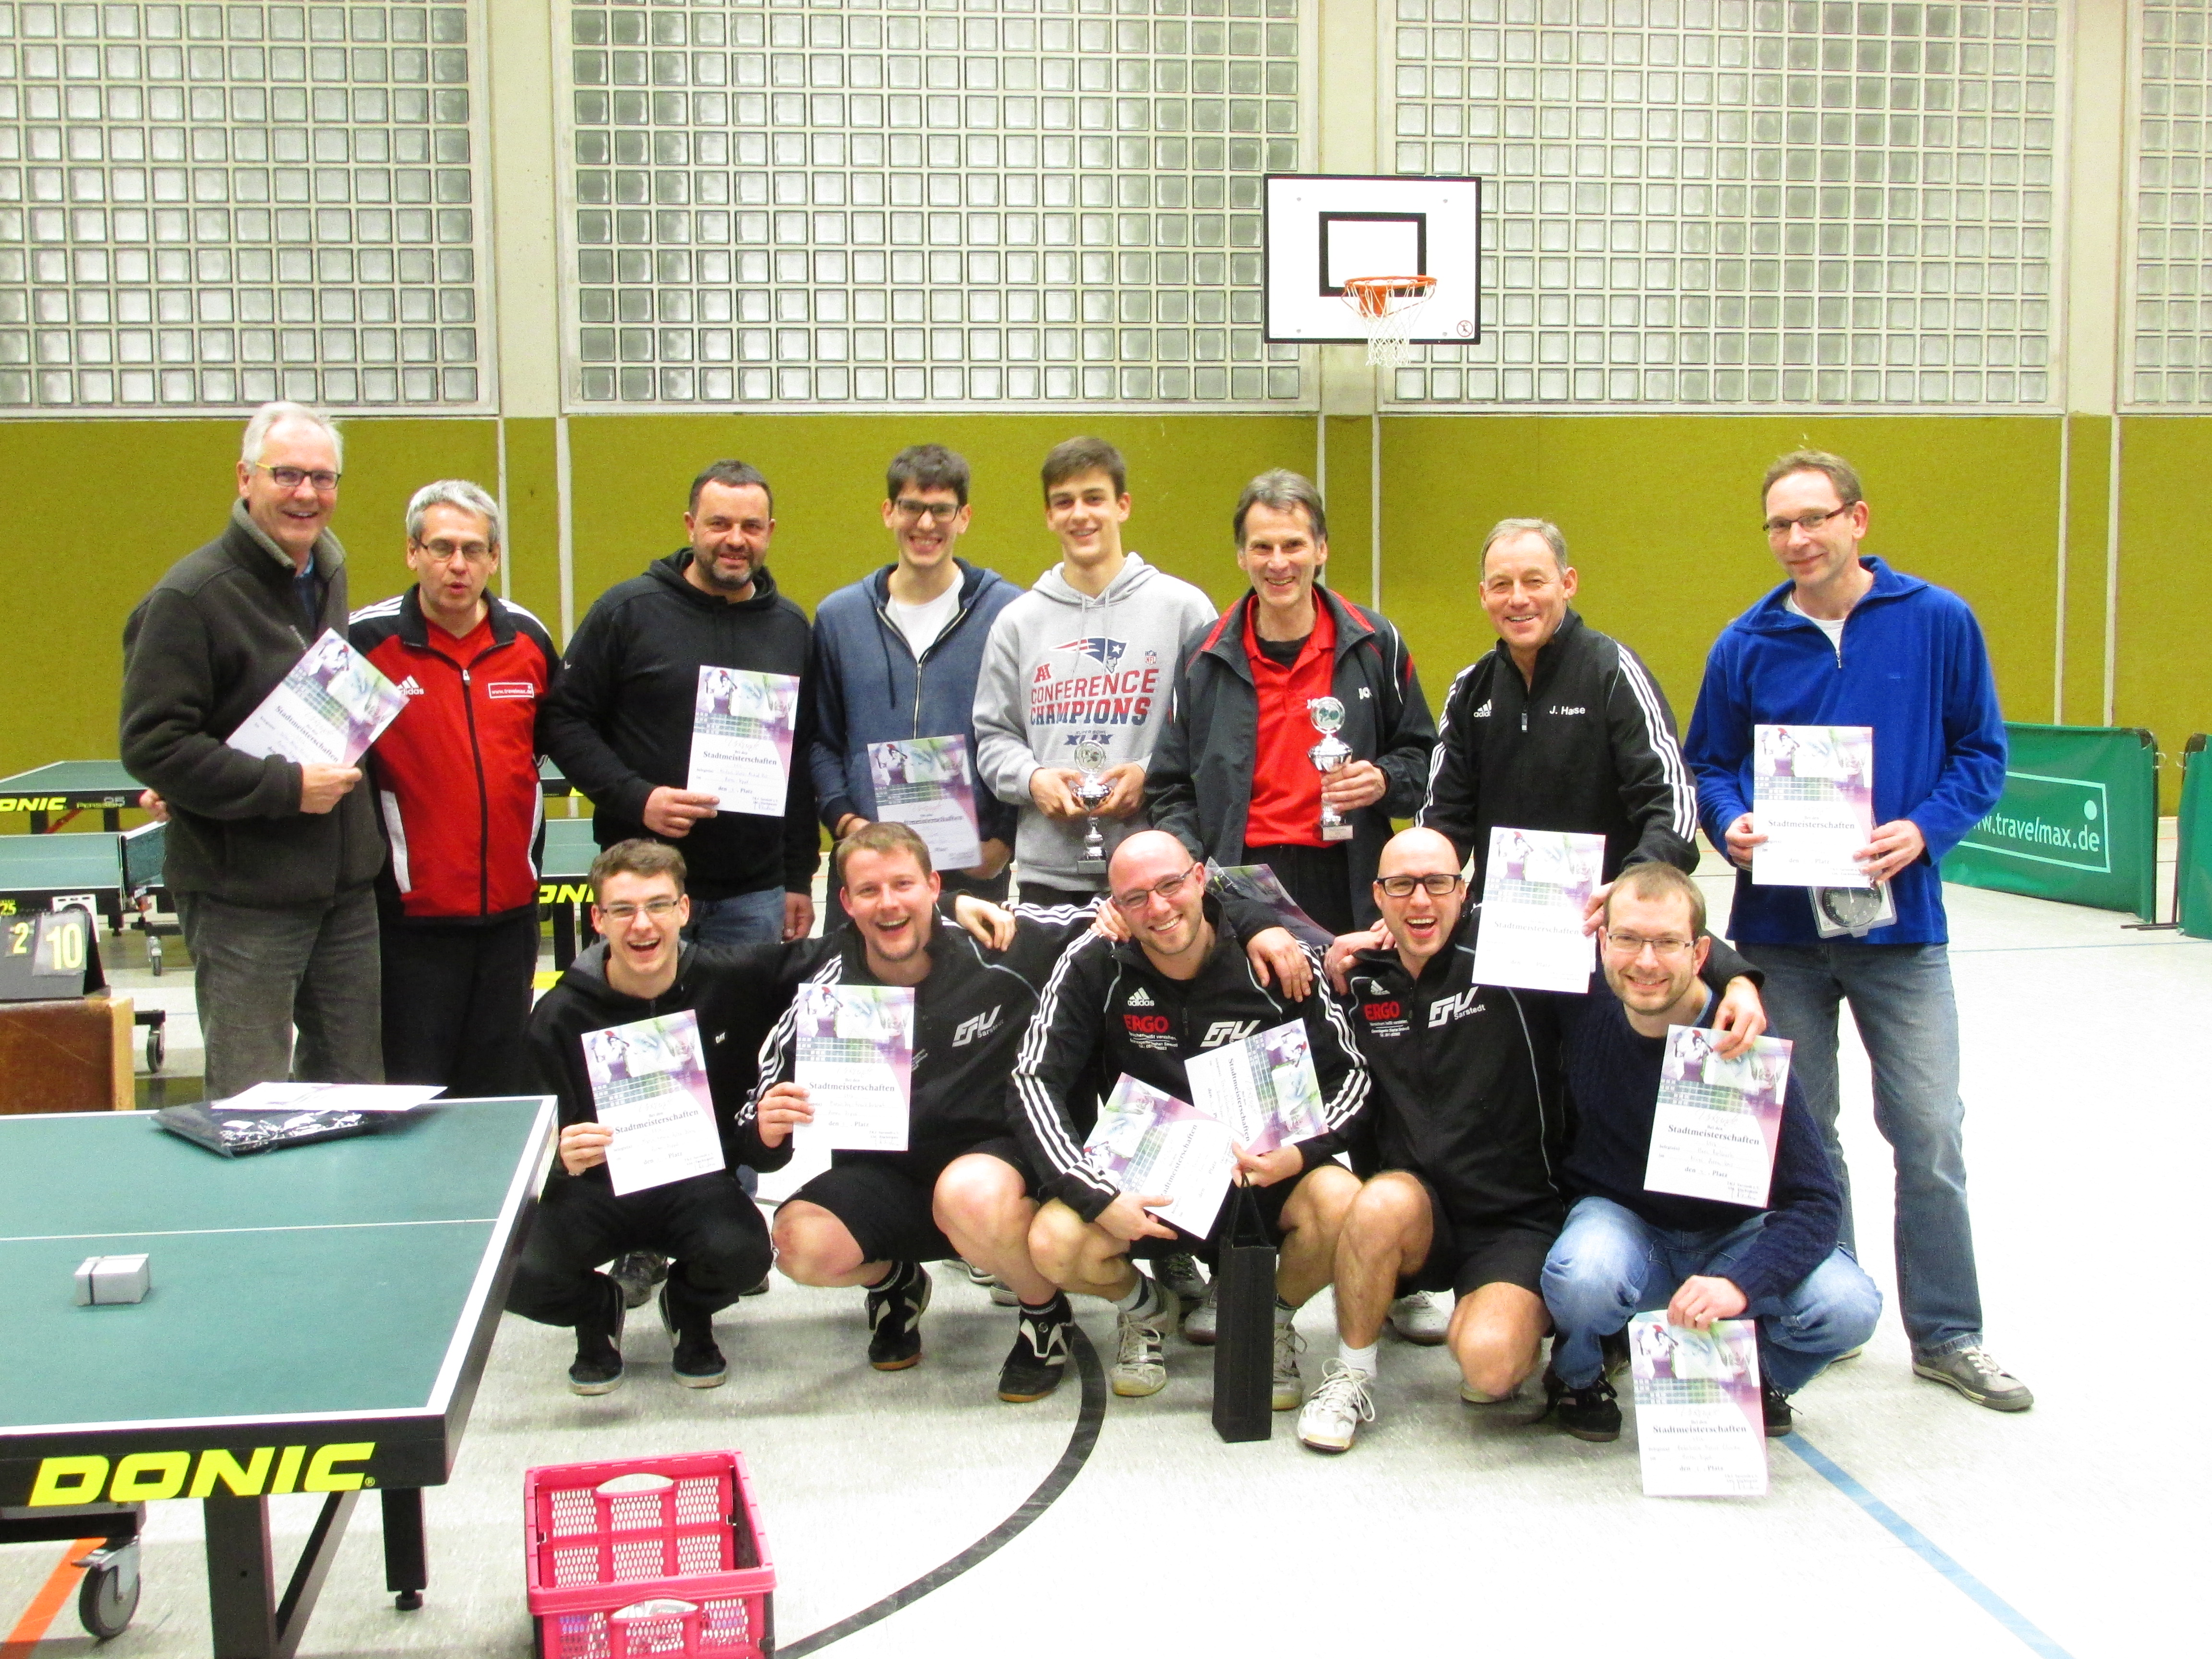 Tischtennis - Stadtmeisterschaft